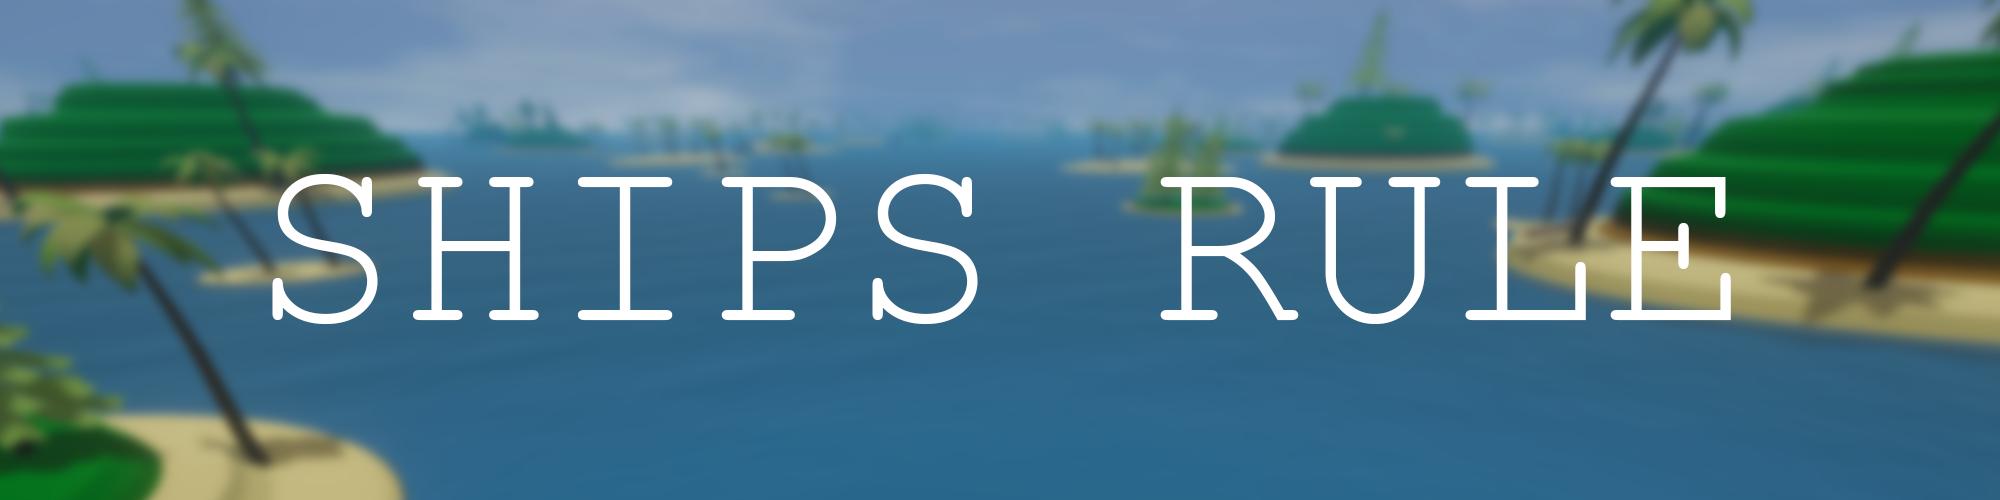 Ships Rule